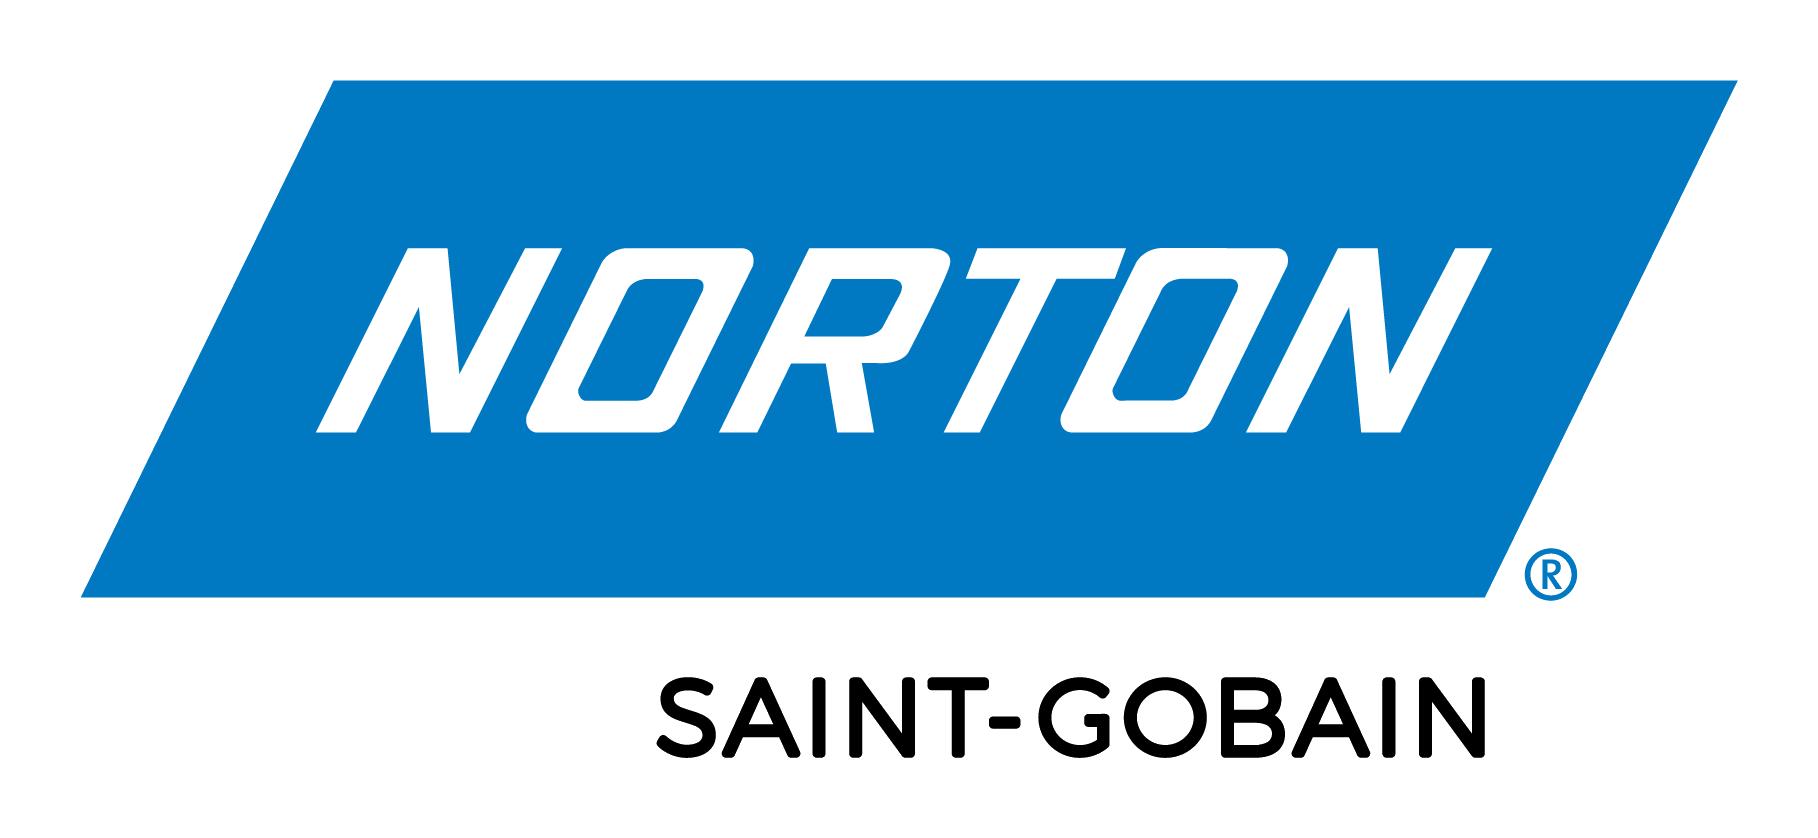 SG_Norton_logo_rgb_11